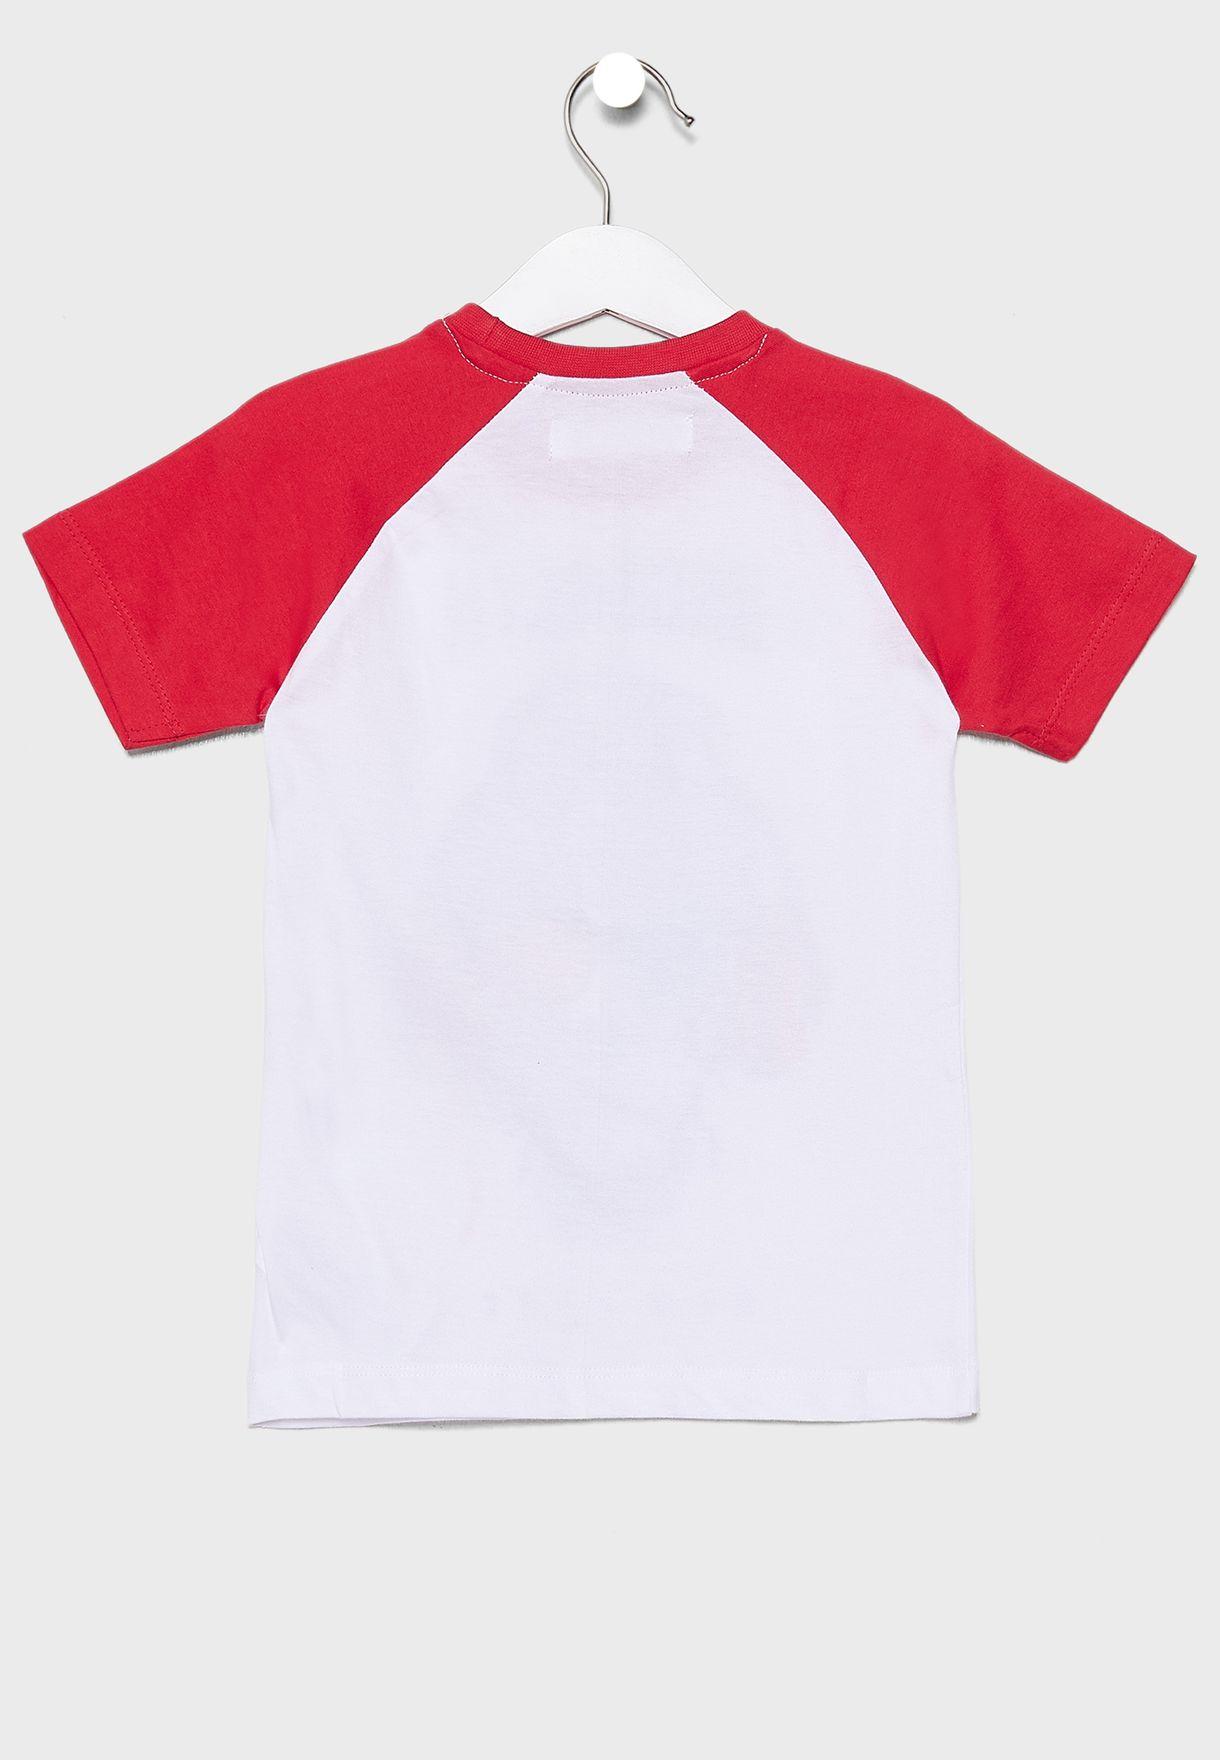 Teen Raglan Graphic T-Shirt